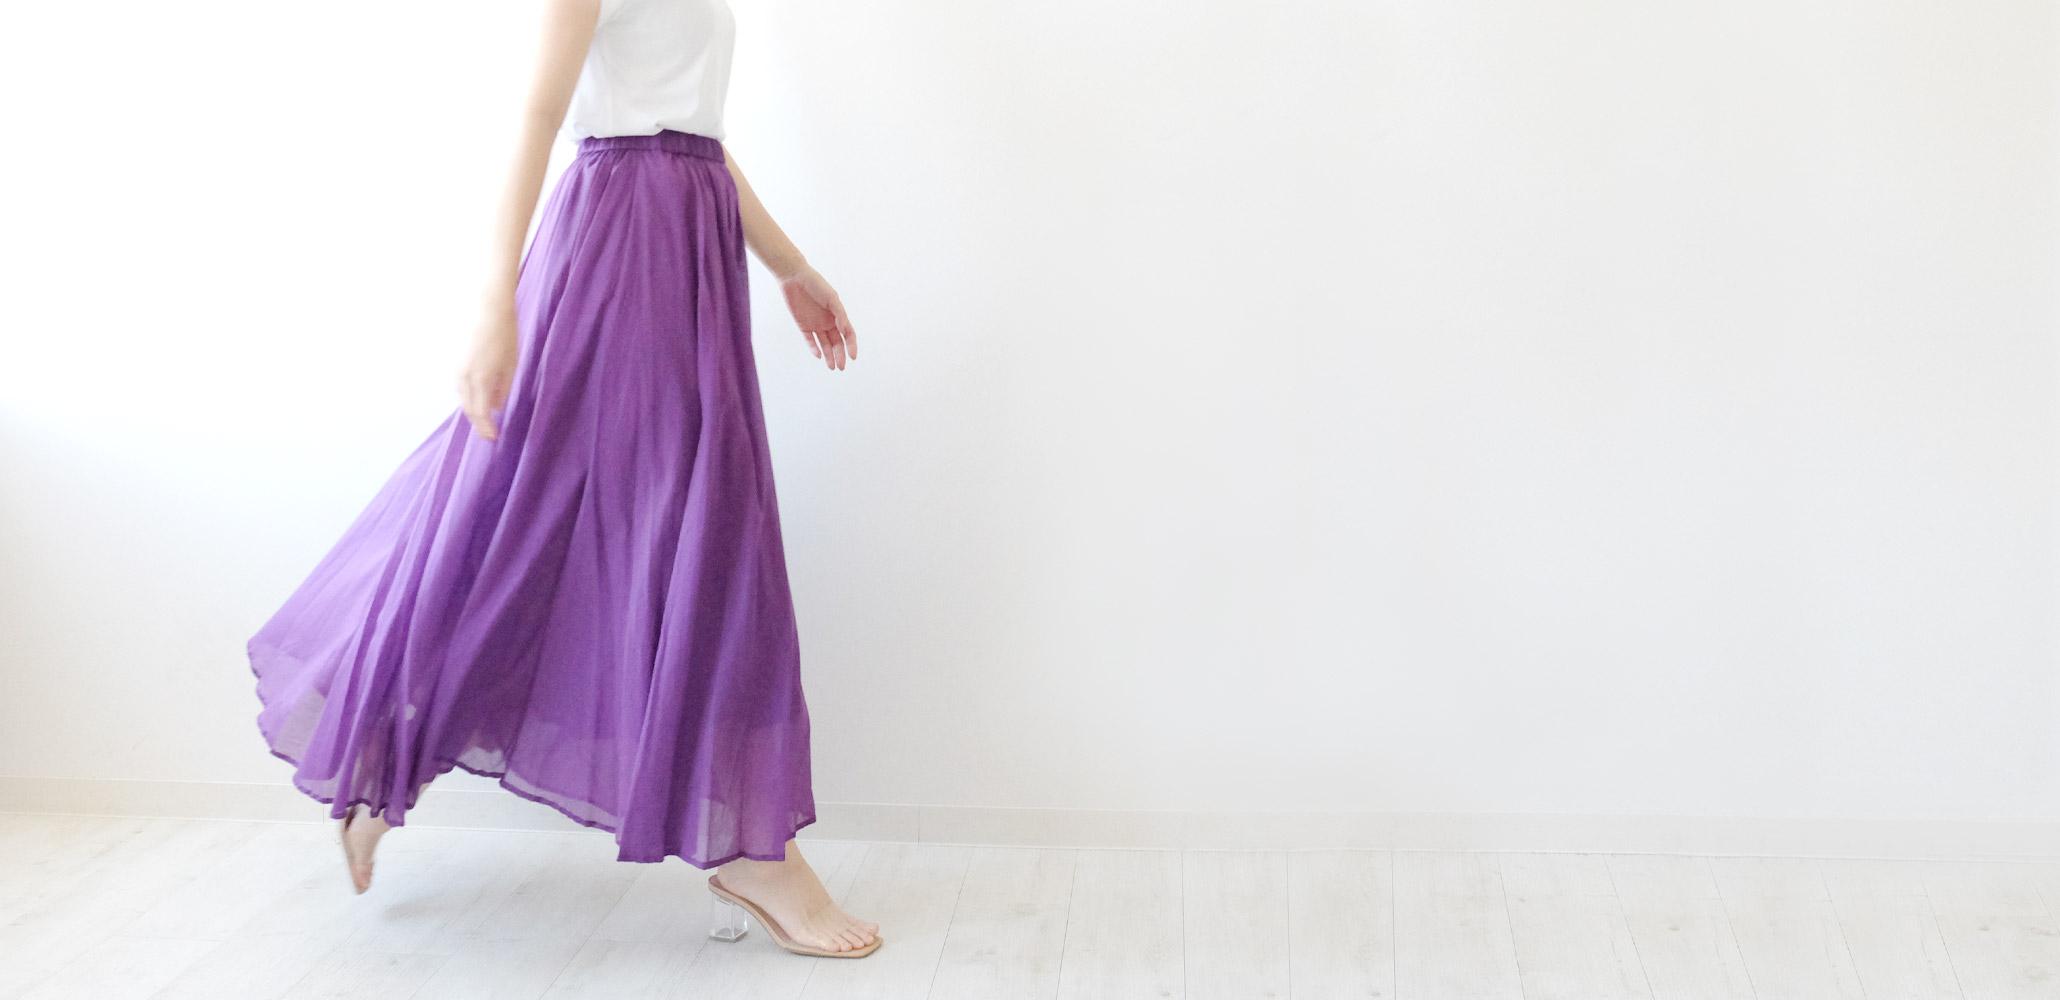 TRECODE人気のサマースカートは、2BUY10%3BUY20%OFF対象